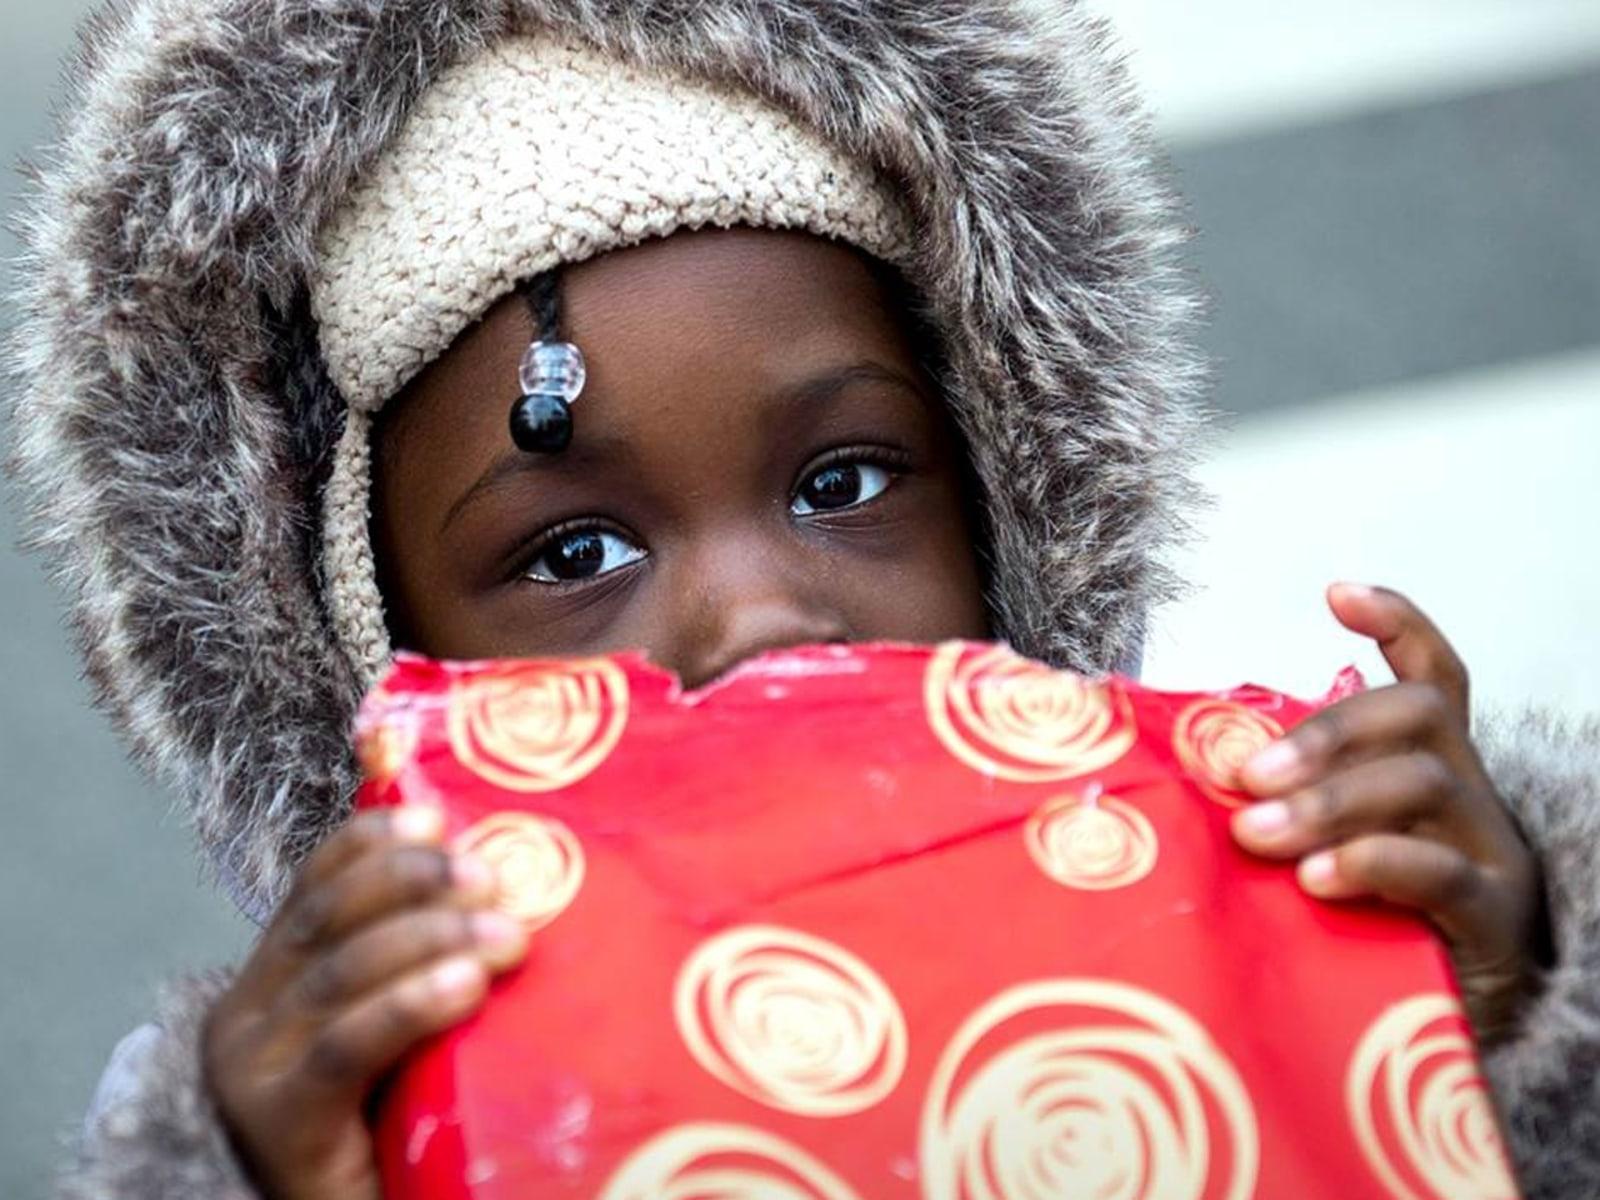 Image: Christmas around the world